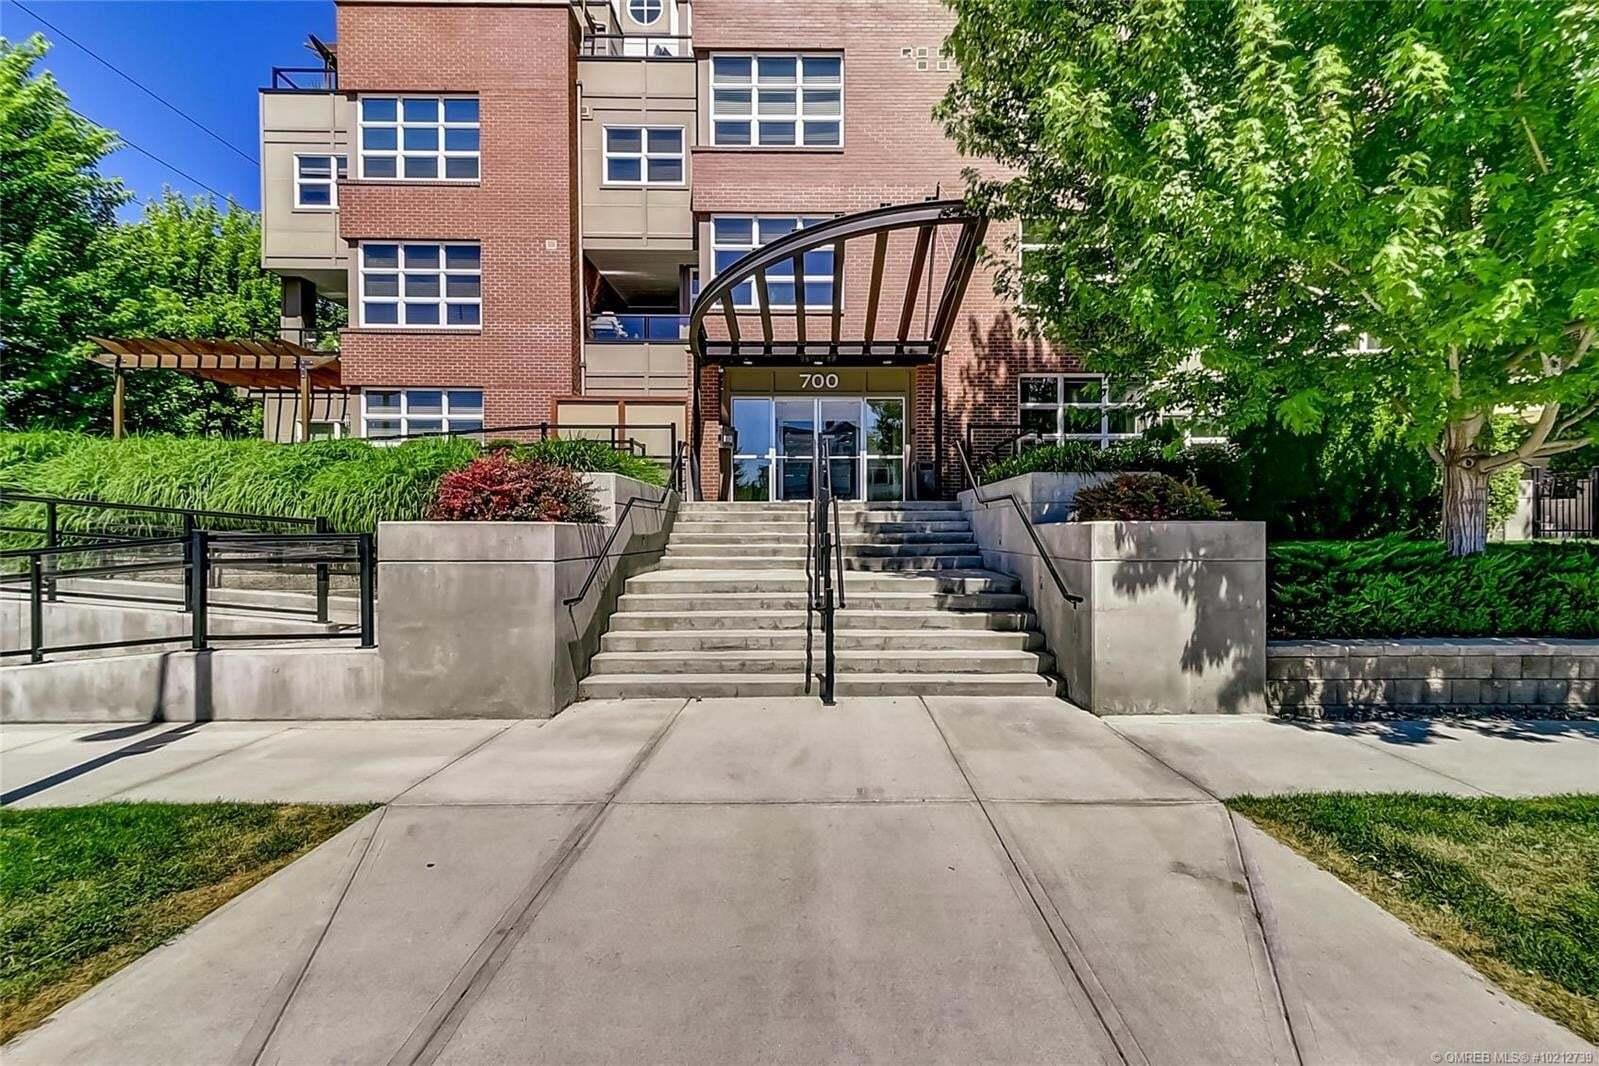 Condo for sale at 700 Martin Ave Kelowna British Columbia - MLS: 10212739